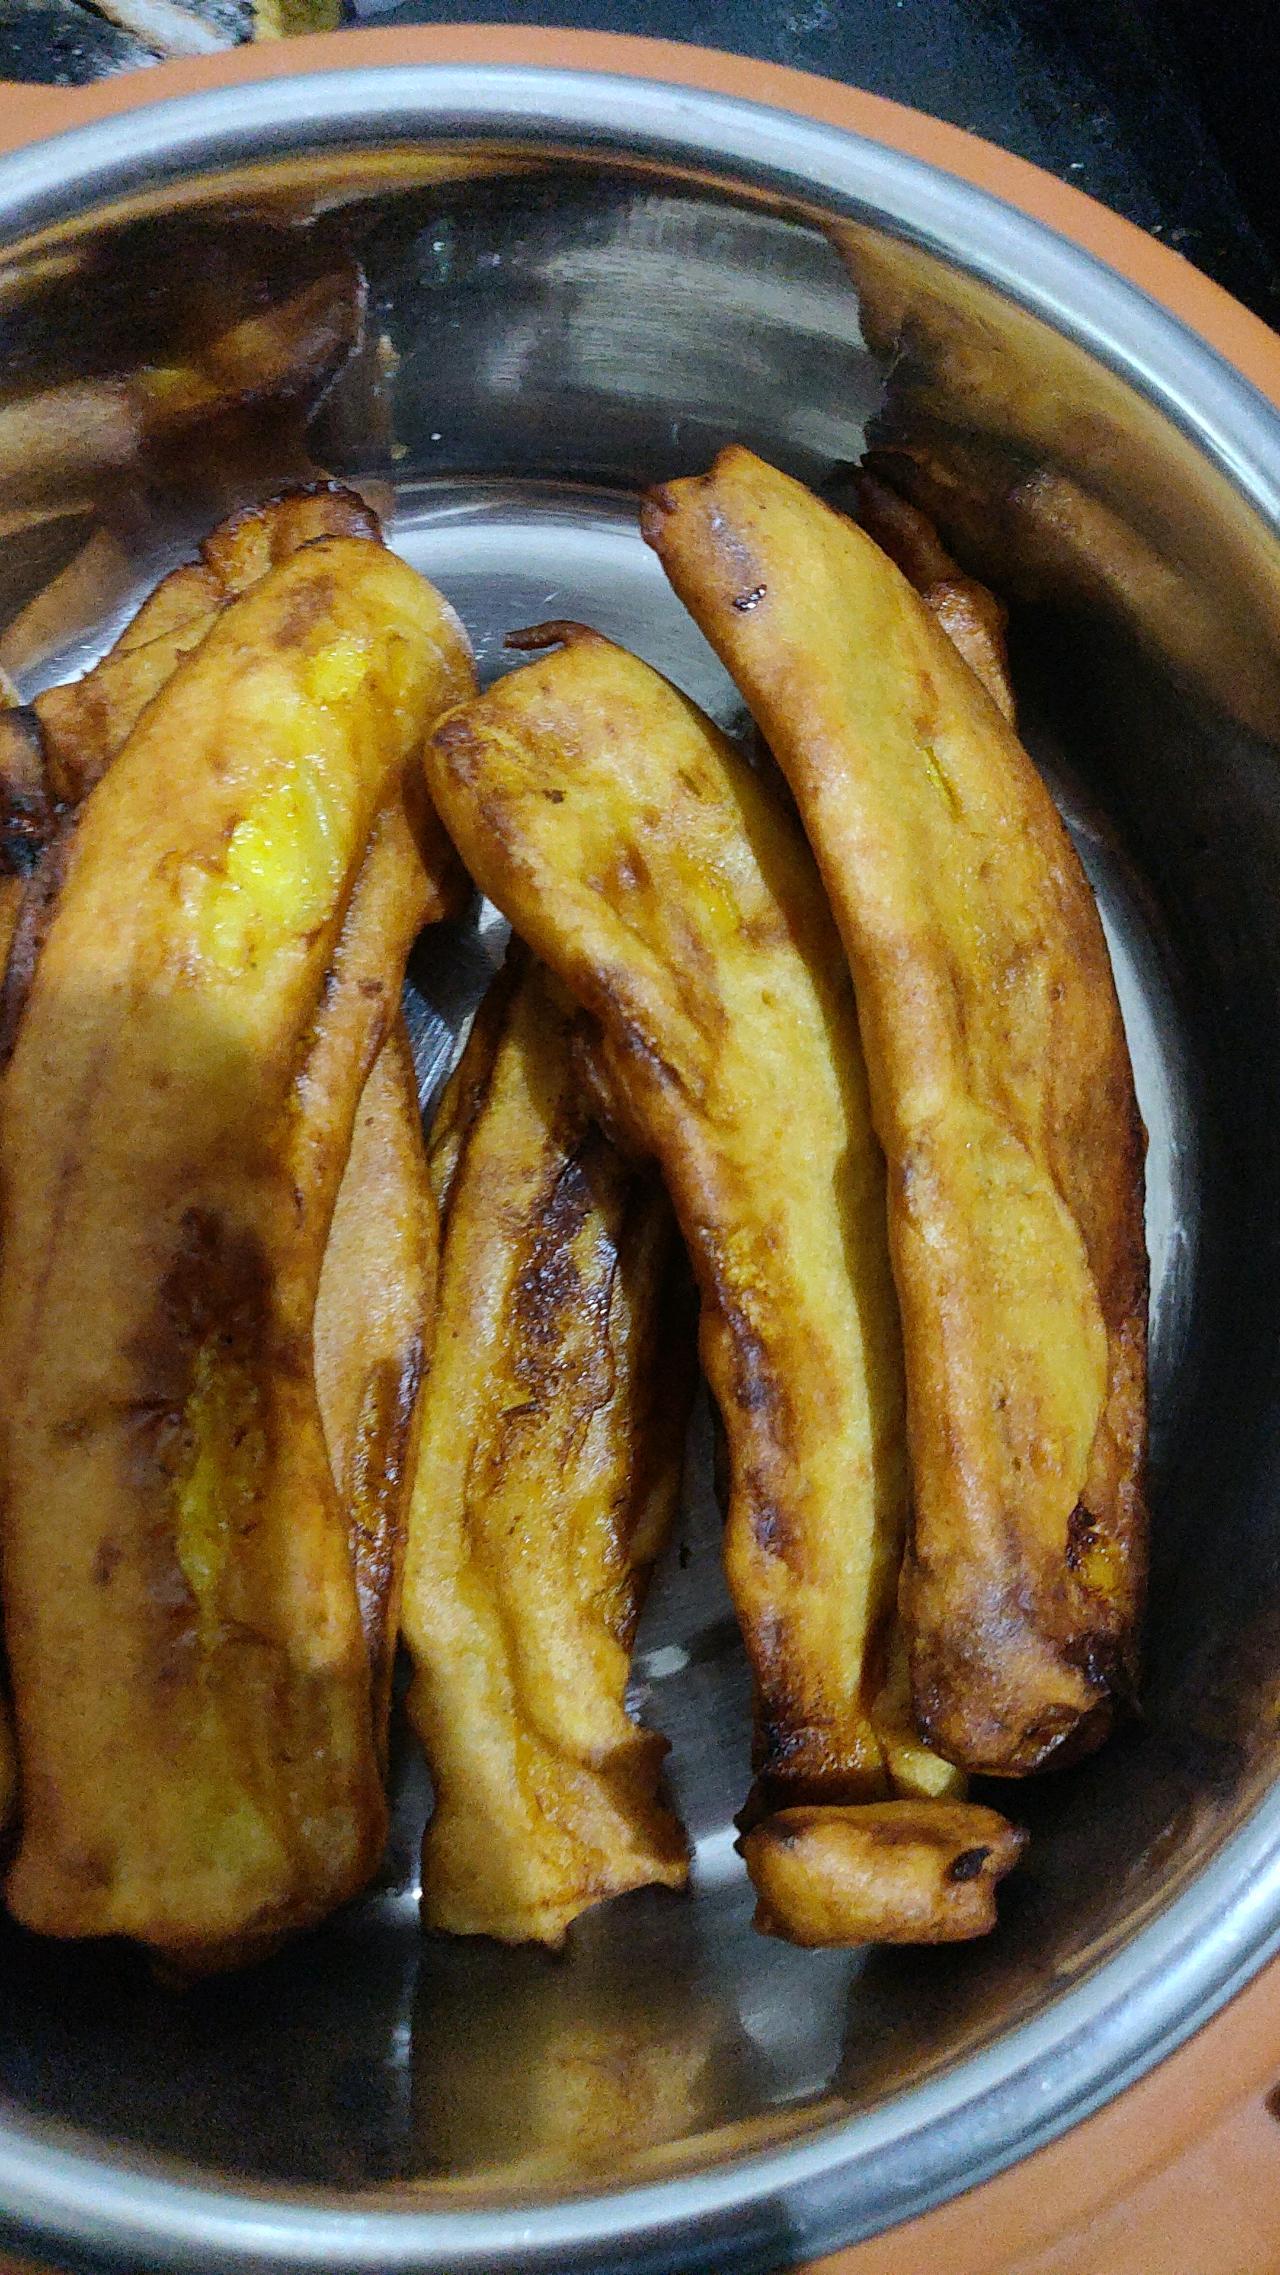 #fried bananas ❤️